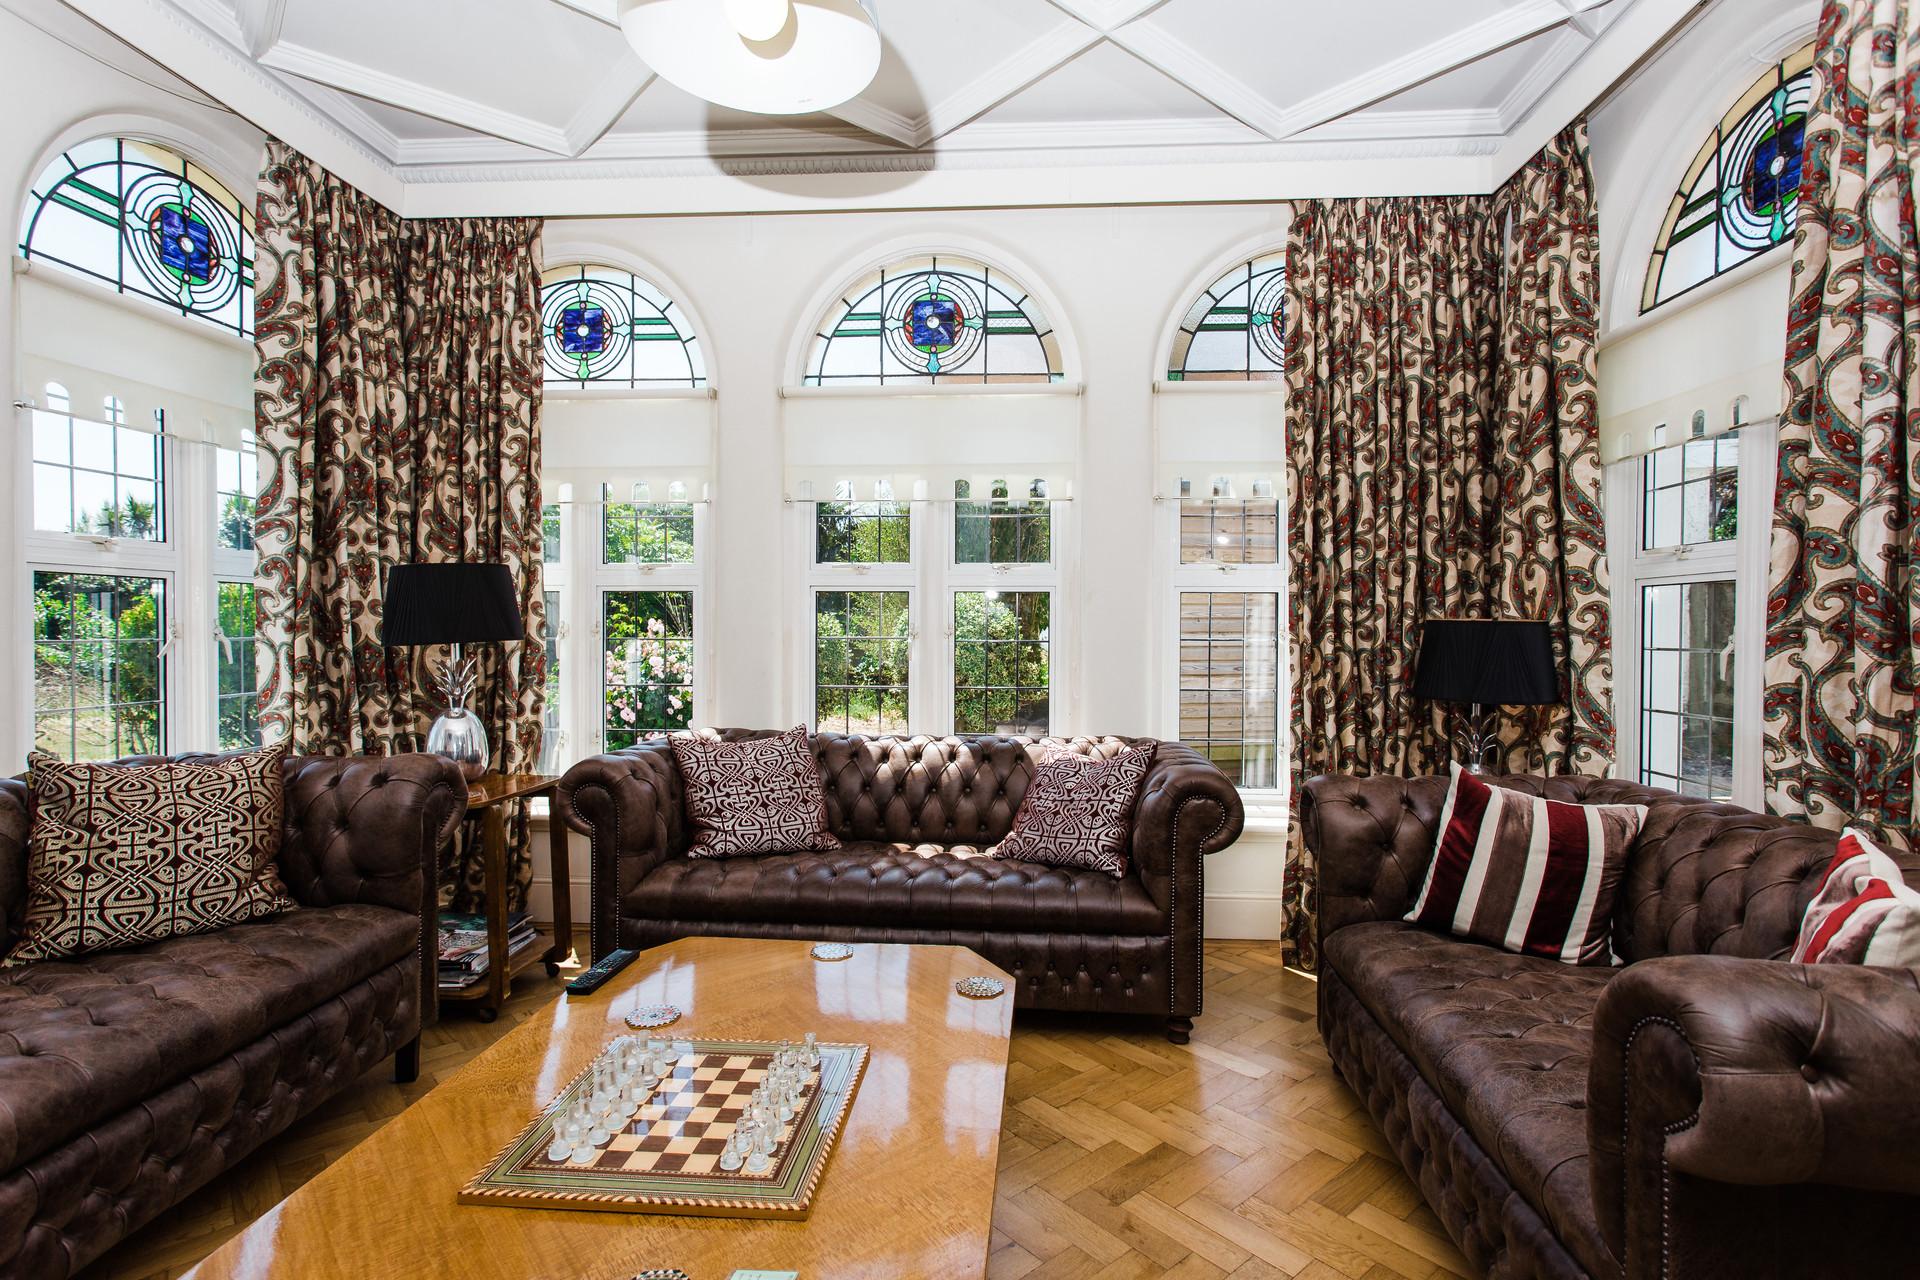 Isle of Wight Property Photographer